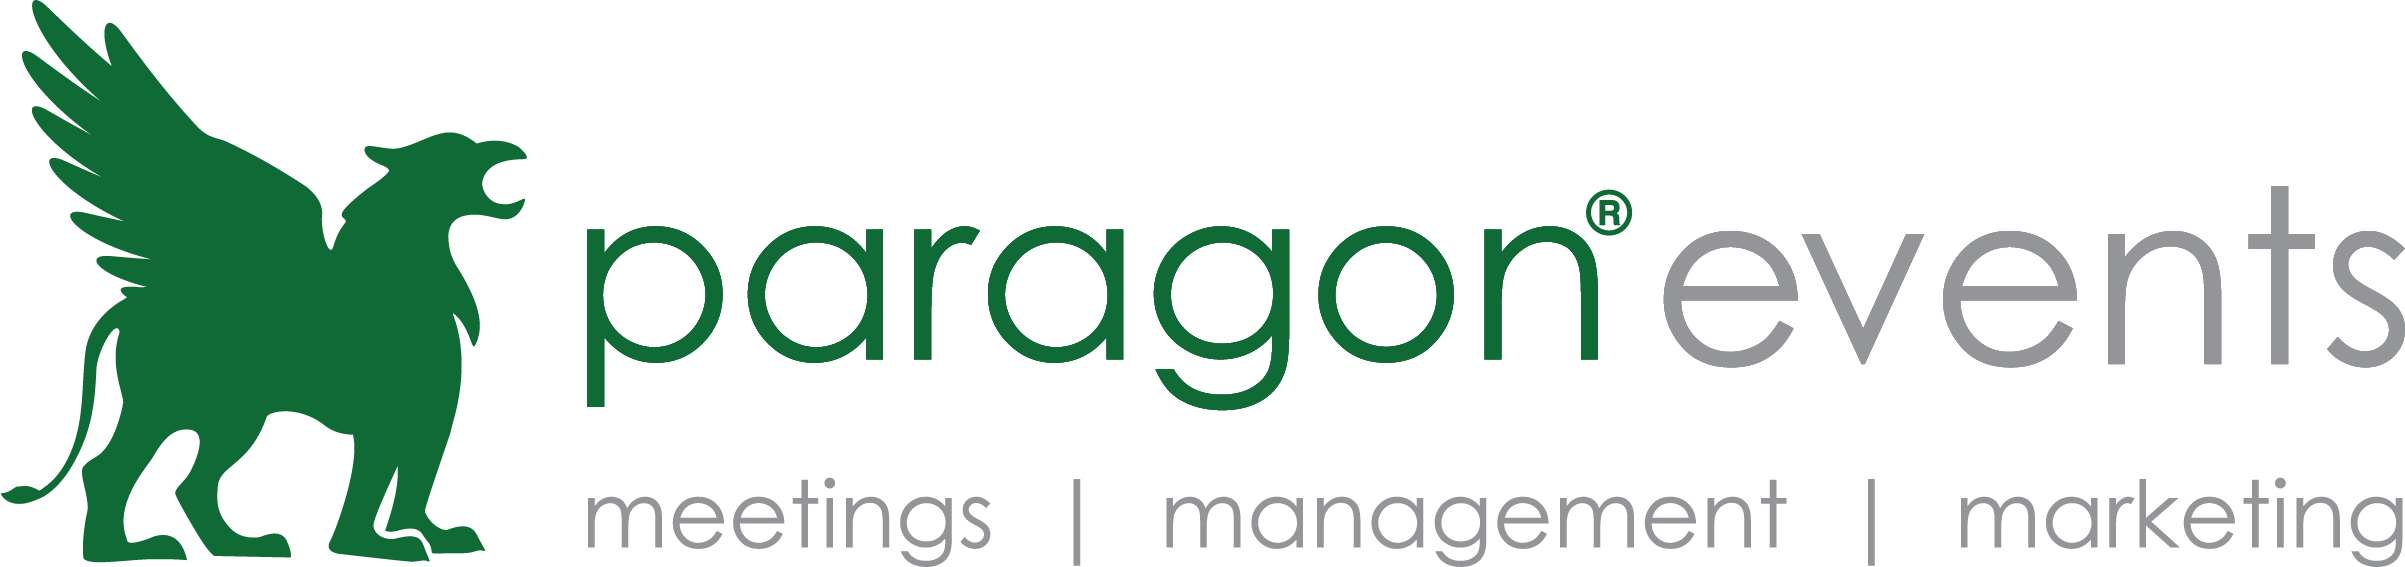 Paragon_Meetings_Green_Gray_Horizontal_Trademark